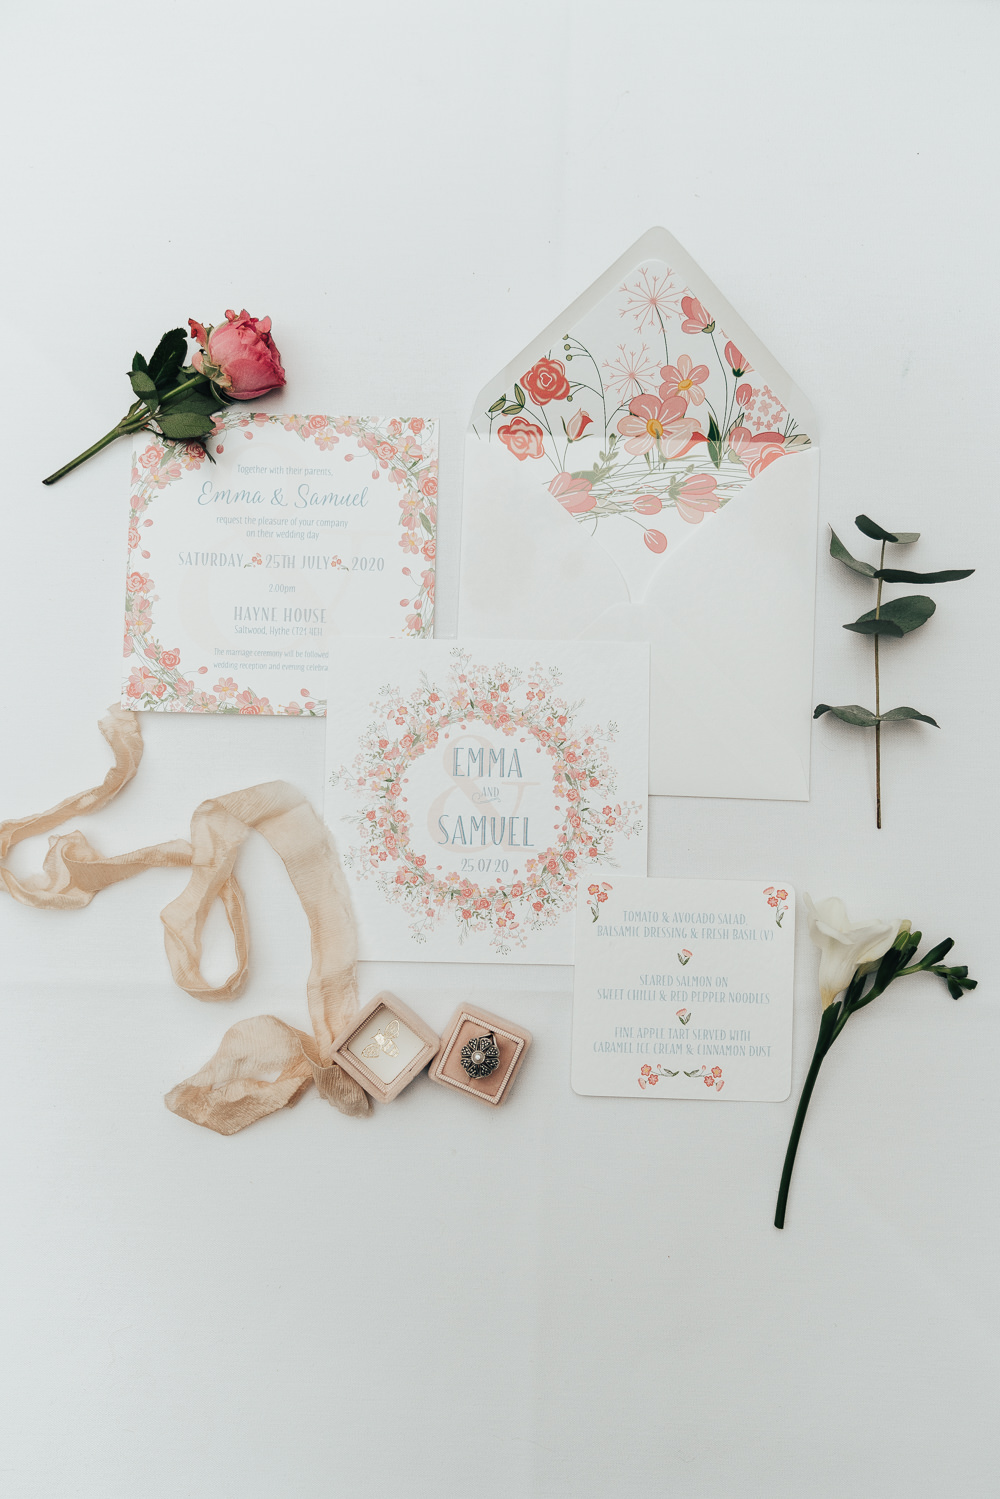 Stationery Invites Invitations Flat Lay Ribbon Flowers Floral Envelope Hoop Wedding Ideas Rebecca Carpenter Photography